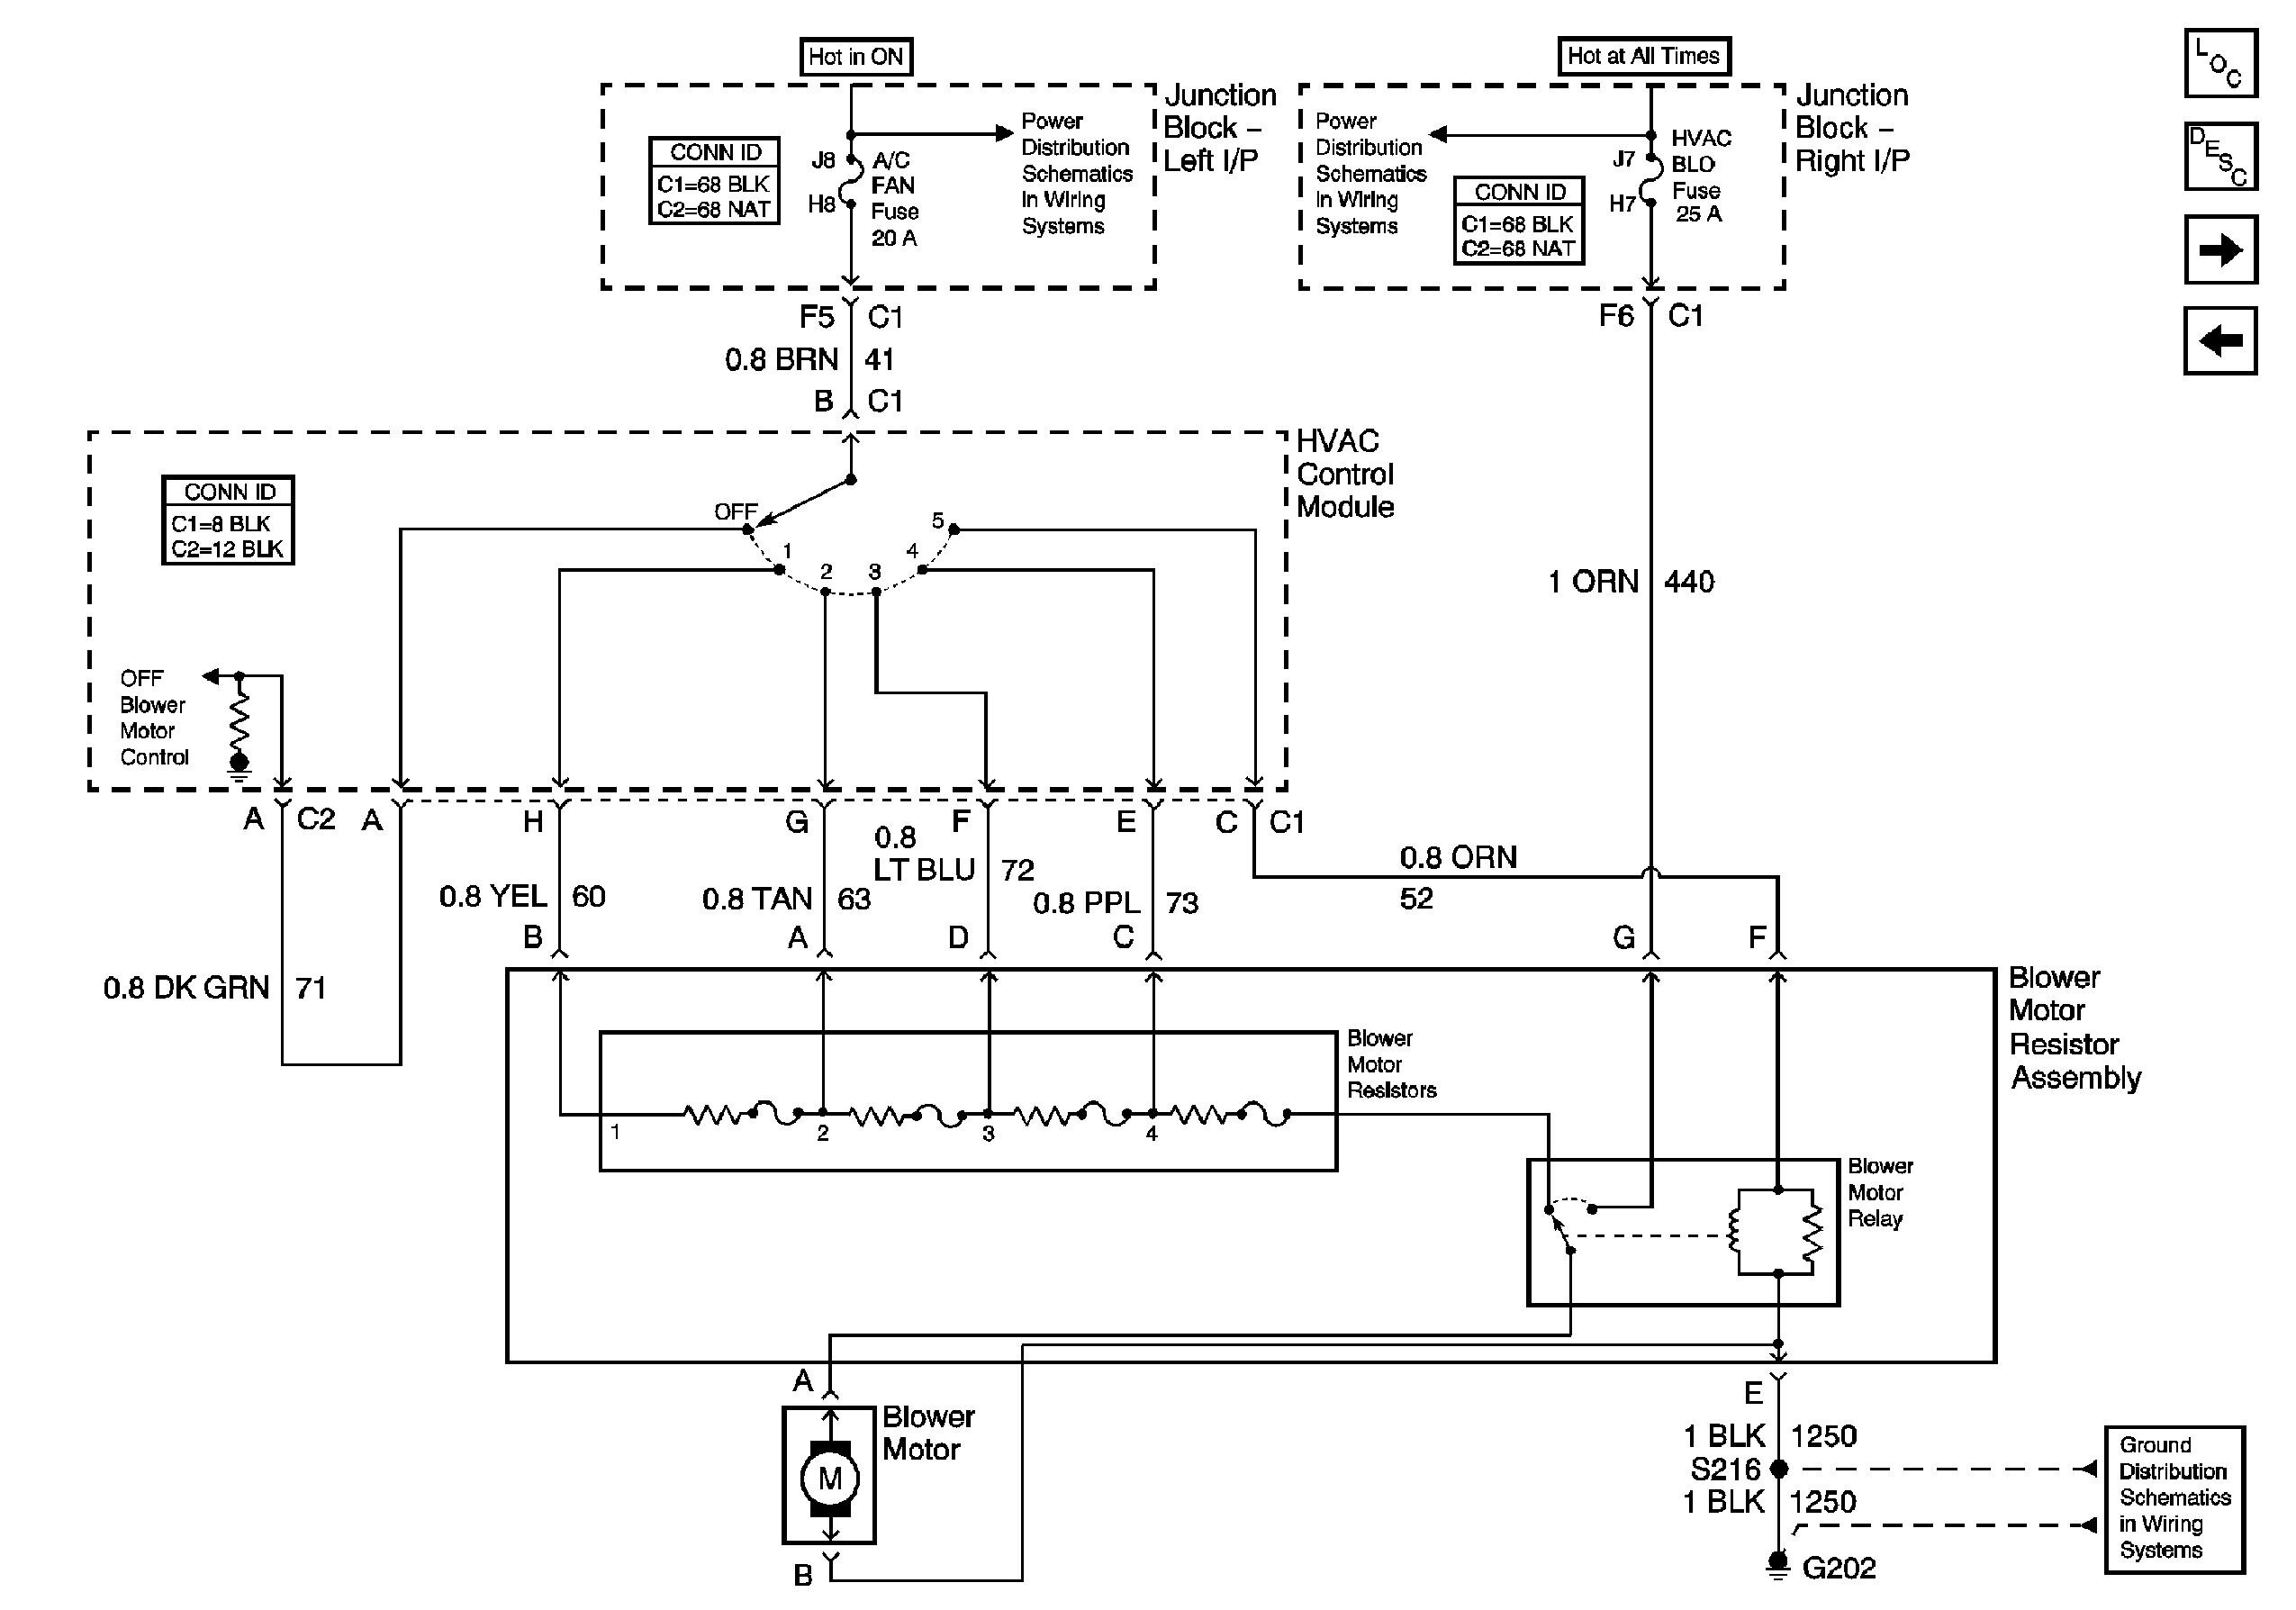 Astounding Gm Blower Motor Wiring Diagram Wiring Diagram Database Wiring Cloud Icalpermsplehendilmohammedshrineorg